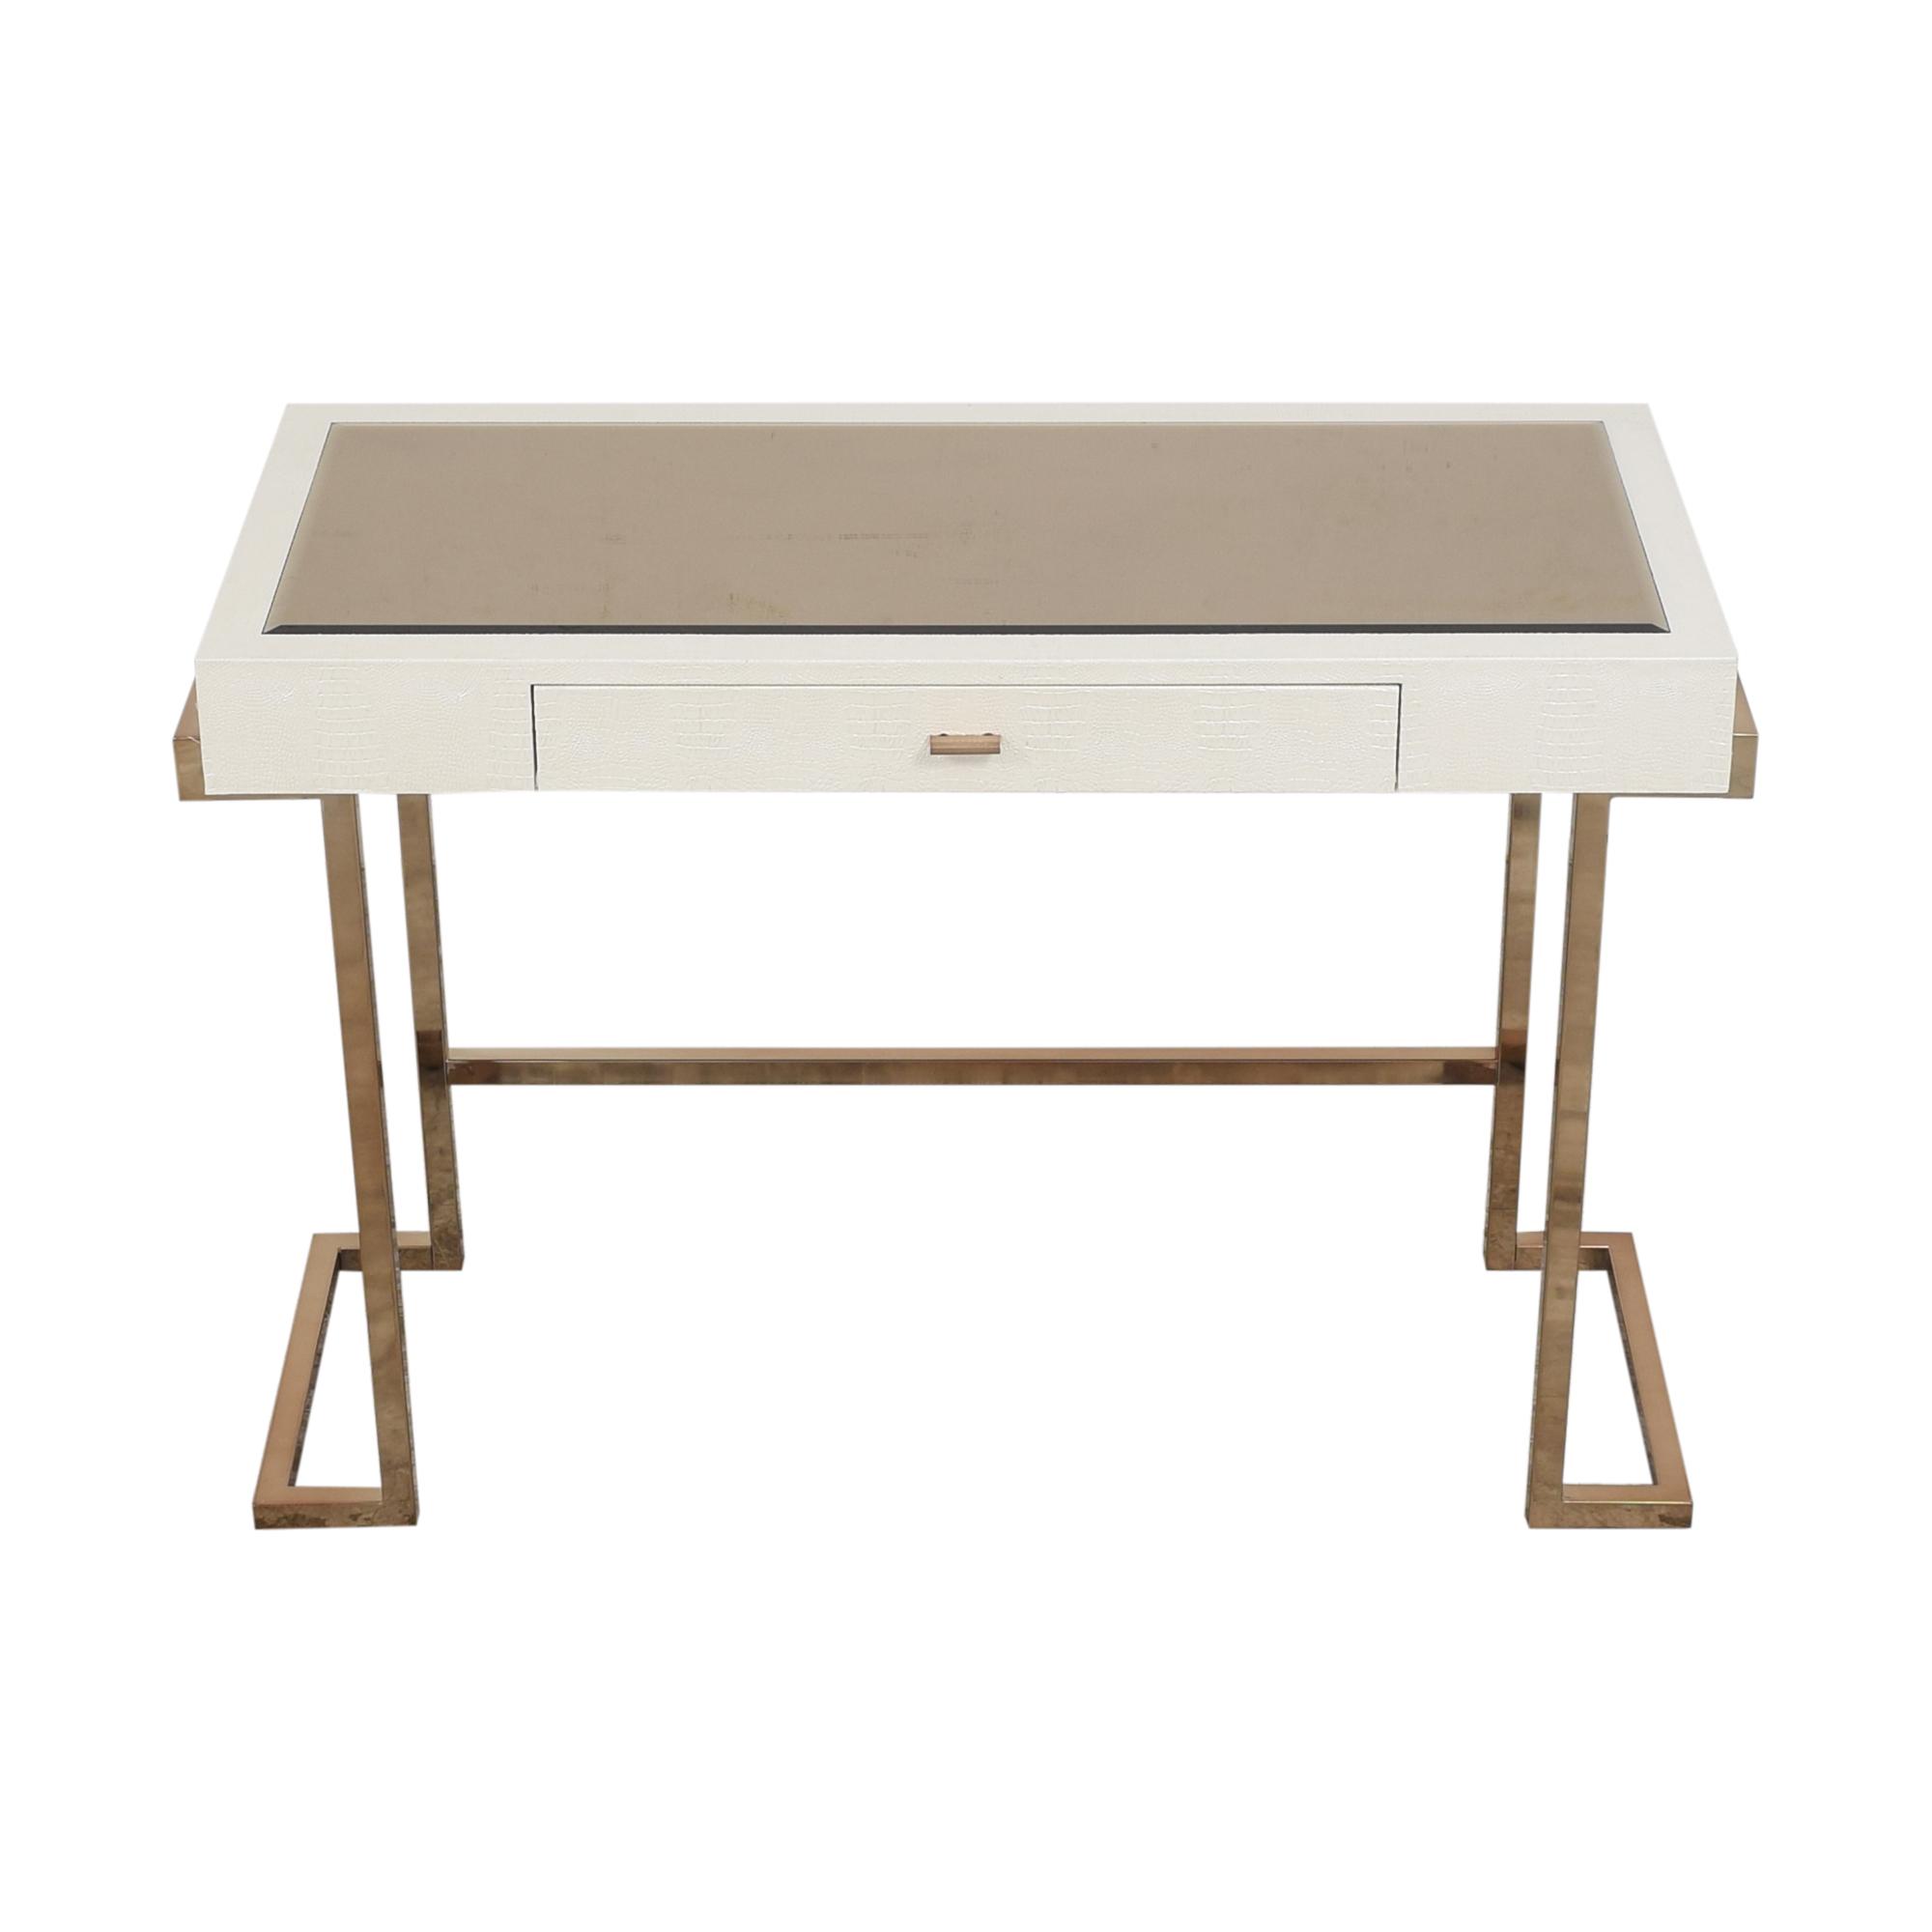 buy Acme White Rectangular One Drawer Writing Desk Acme Tables